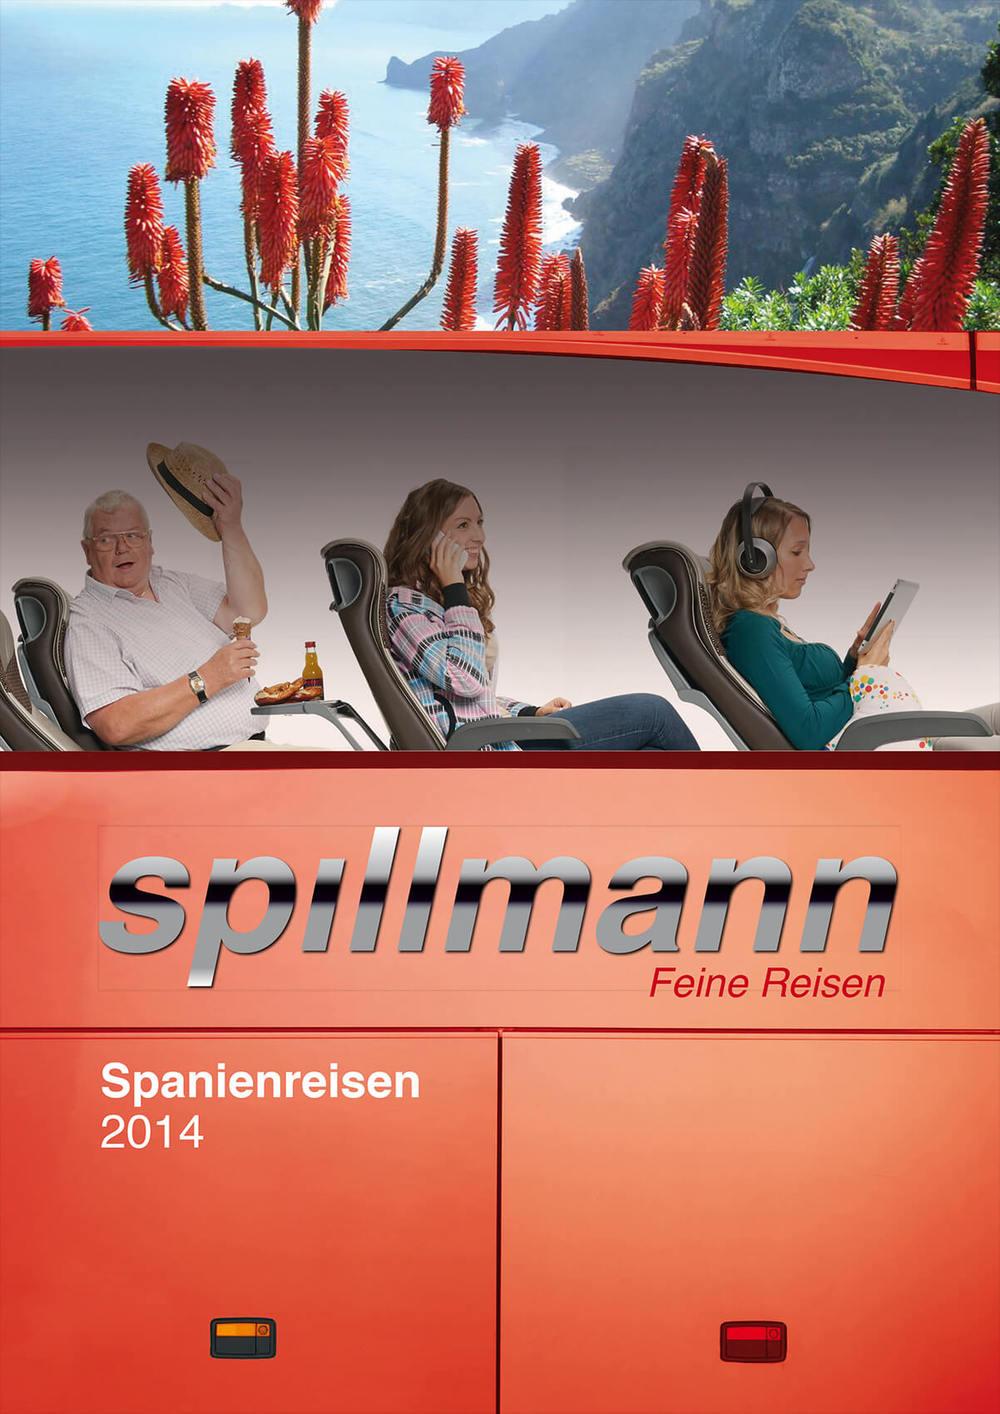 spanien-reisekatalog-spillmann-agentur-intermar-corporate.jpg